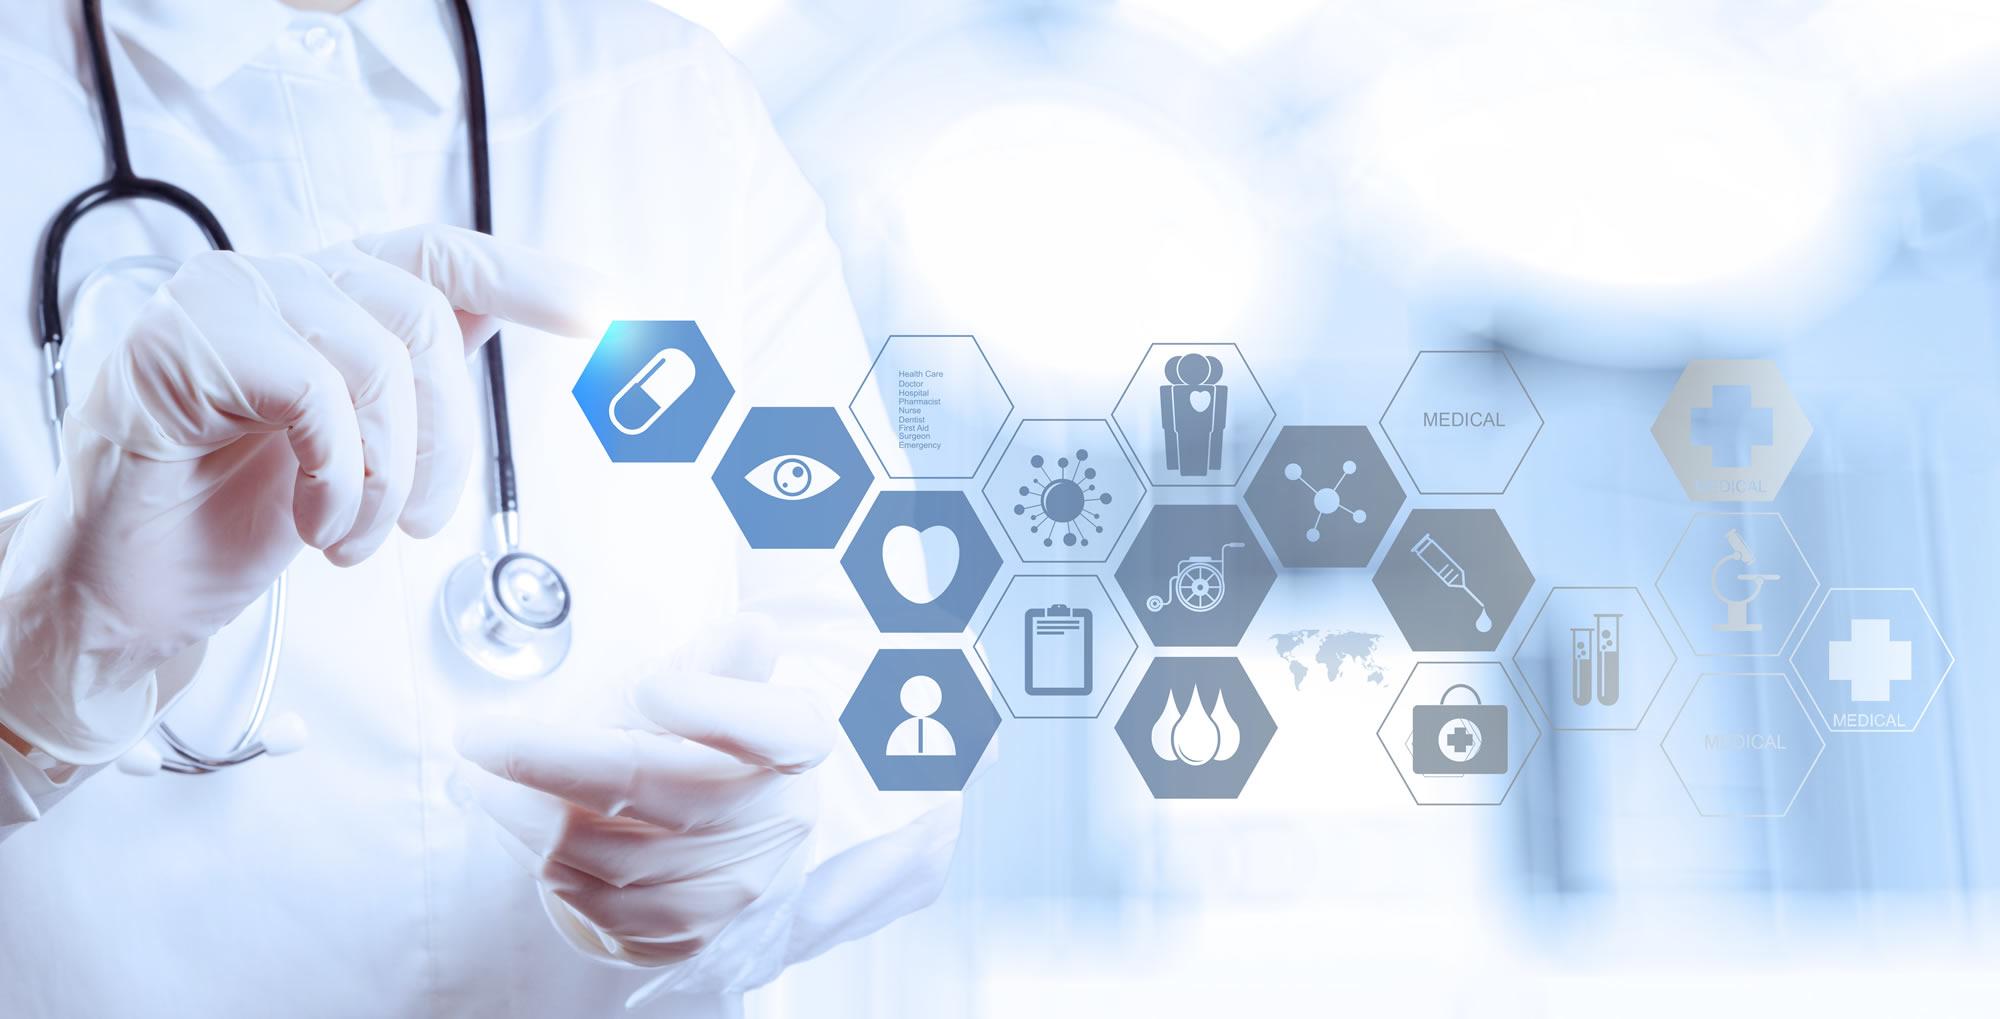 veruci genitale patogeni hpv warts face treatment